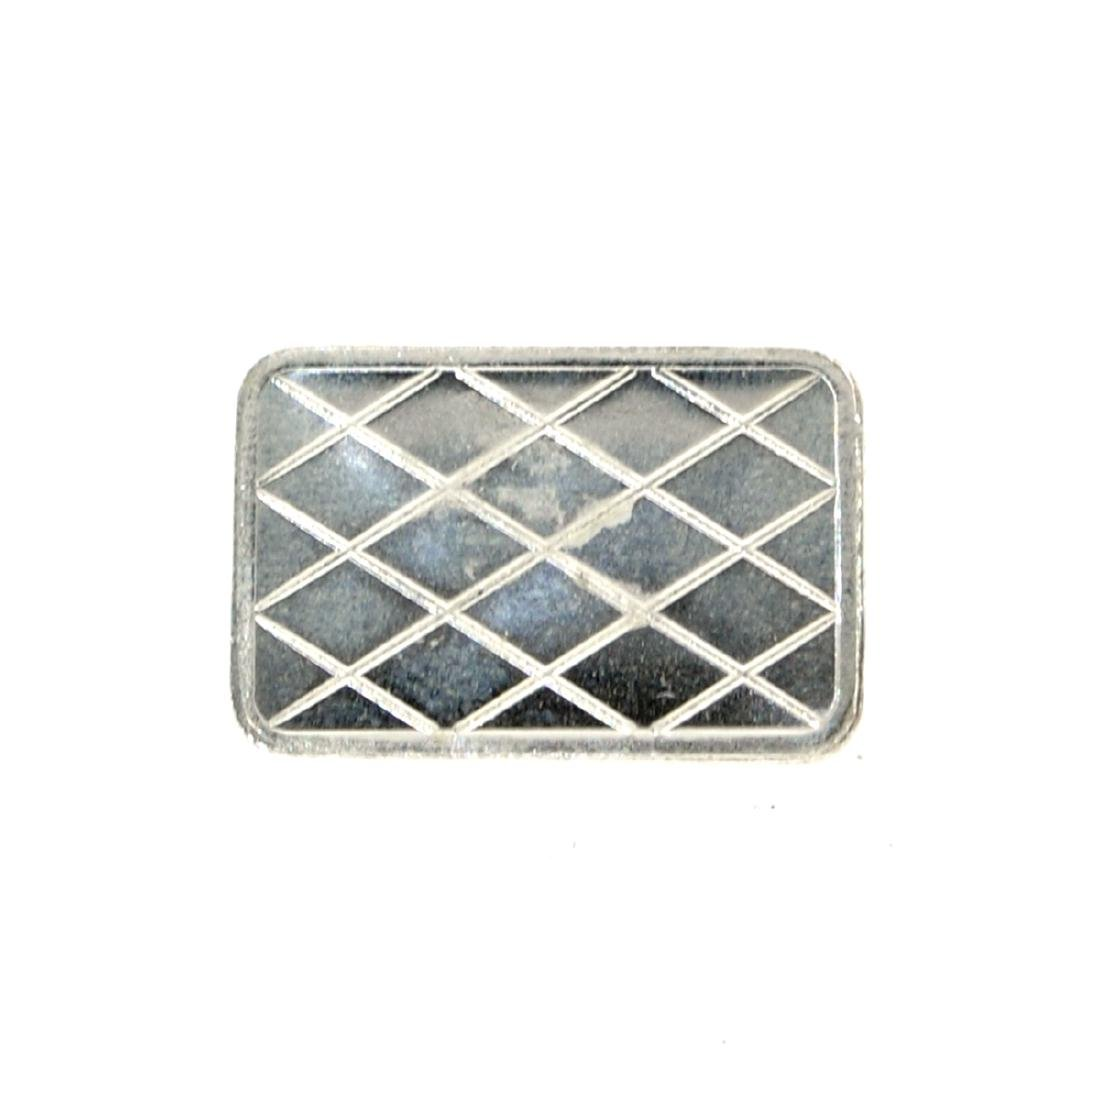 1 Gram Tank Design .999 Fine Silver Bar - 2